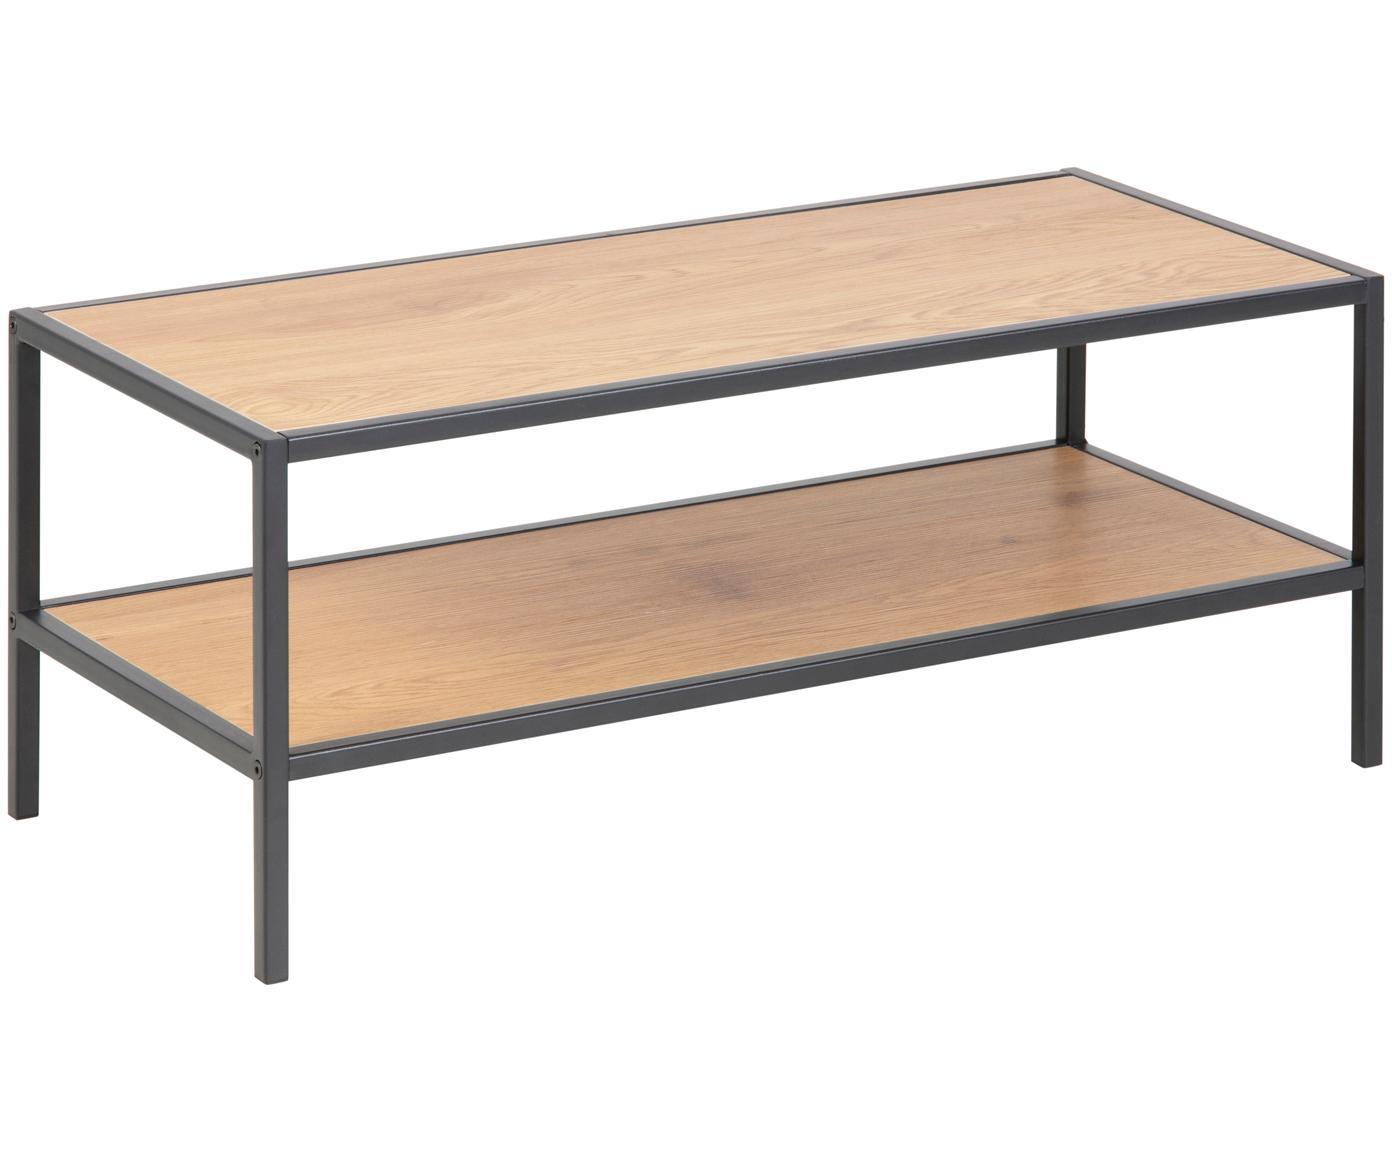 Zapatero Seaford, 2 estantes, Estantes: tablero de fibras de dens, Estructura: metal con pintura en polv, Roble, An 77 x Al 32 cm